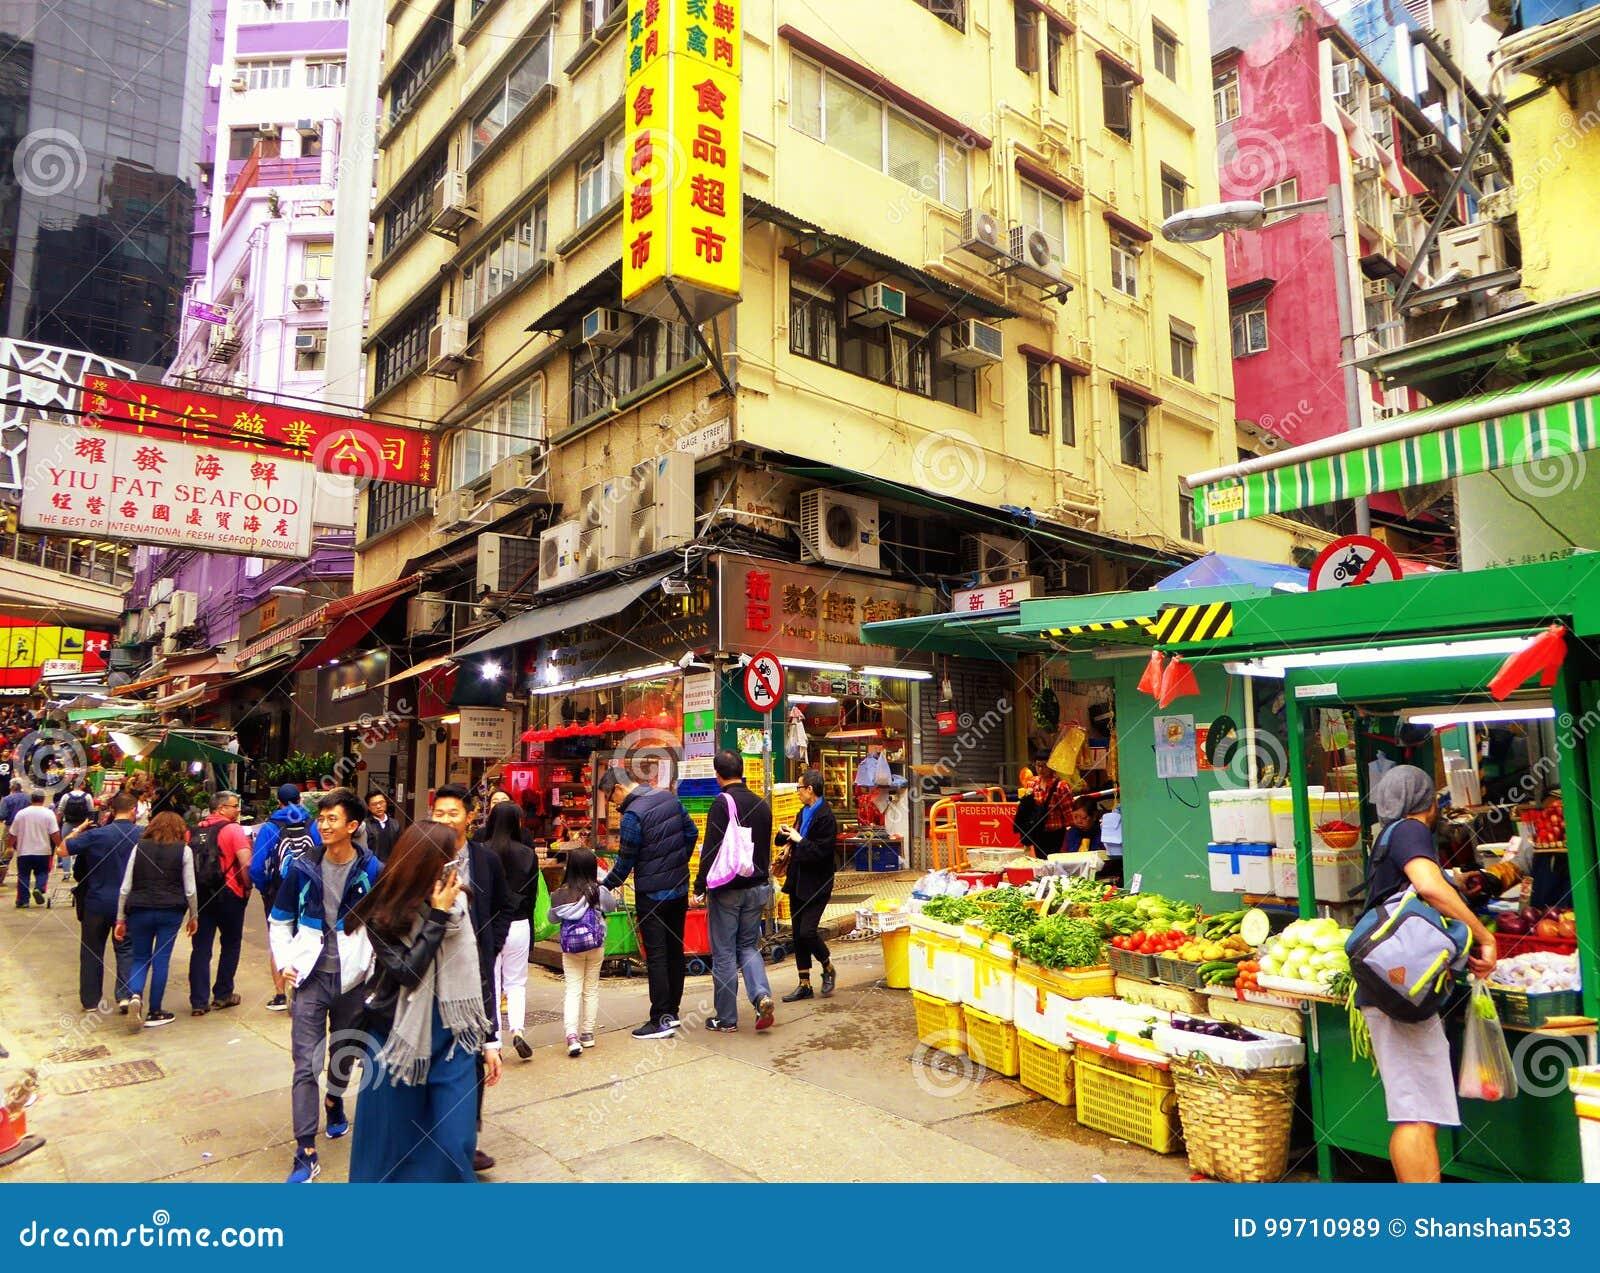 Hongkong Food Market Street